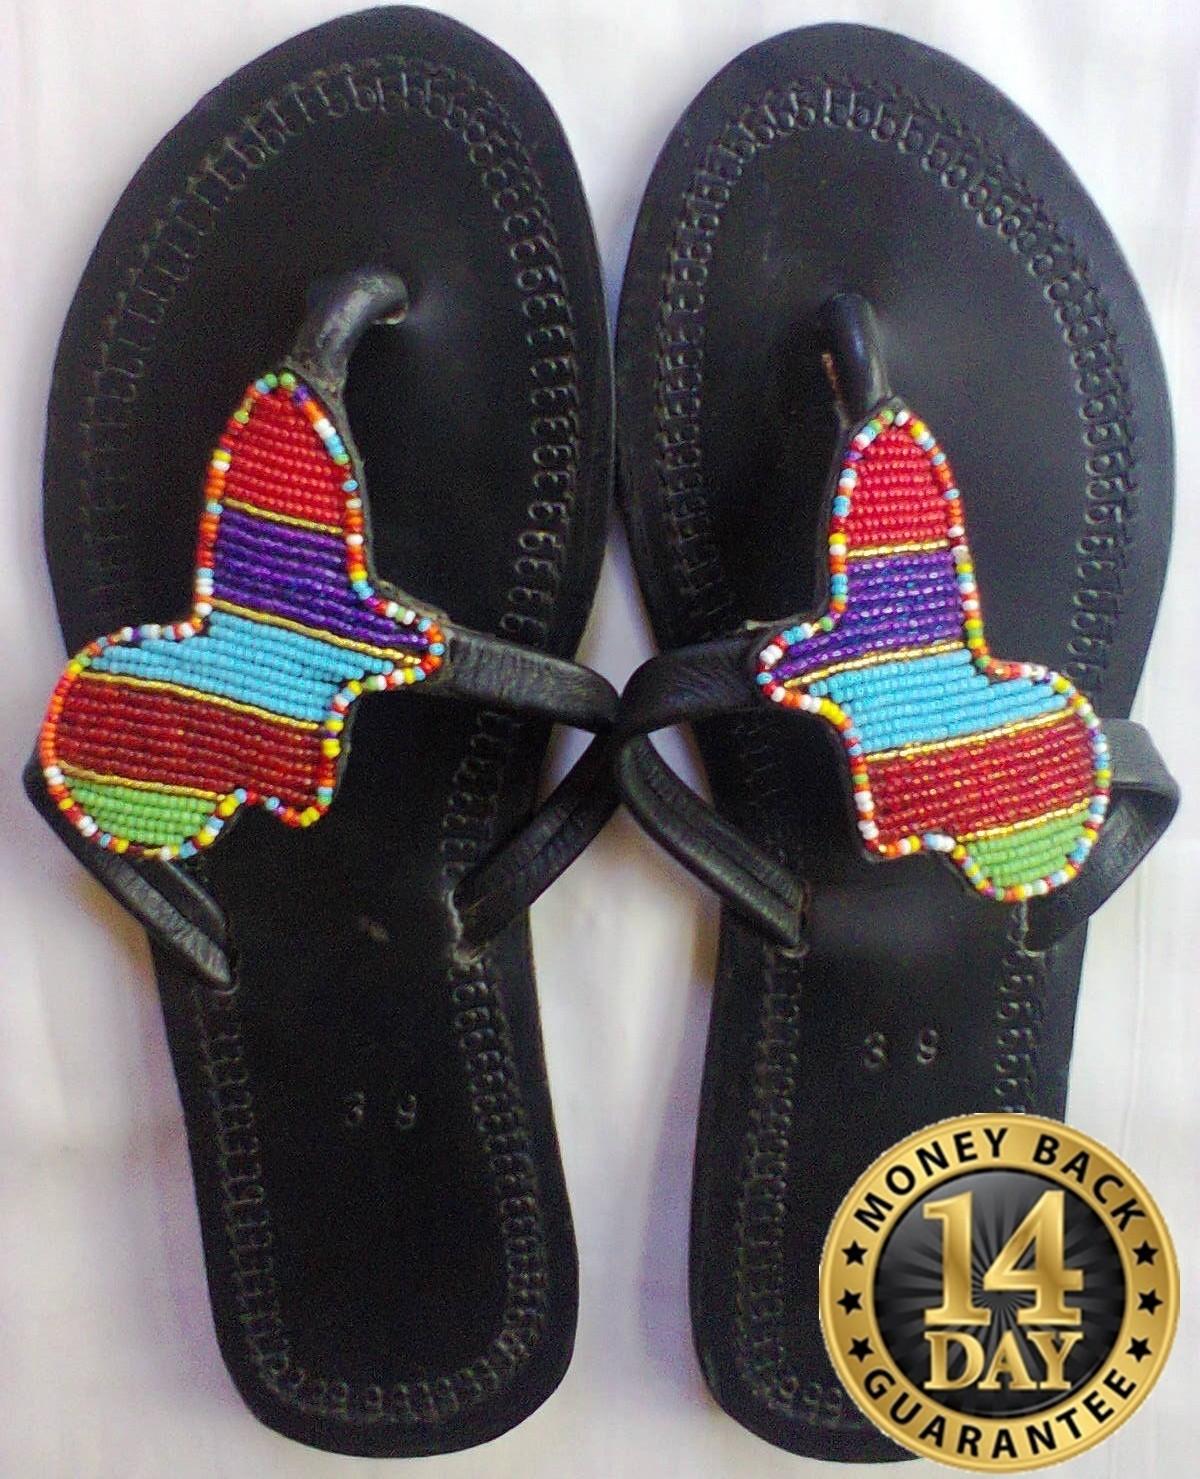 Authentic Masai sandals-women beaded sandals U.S size 9.5